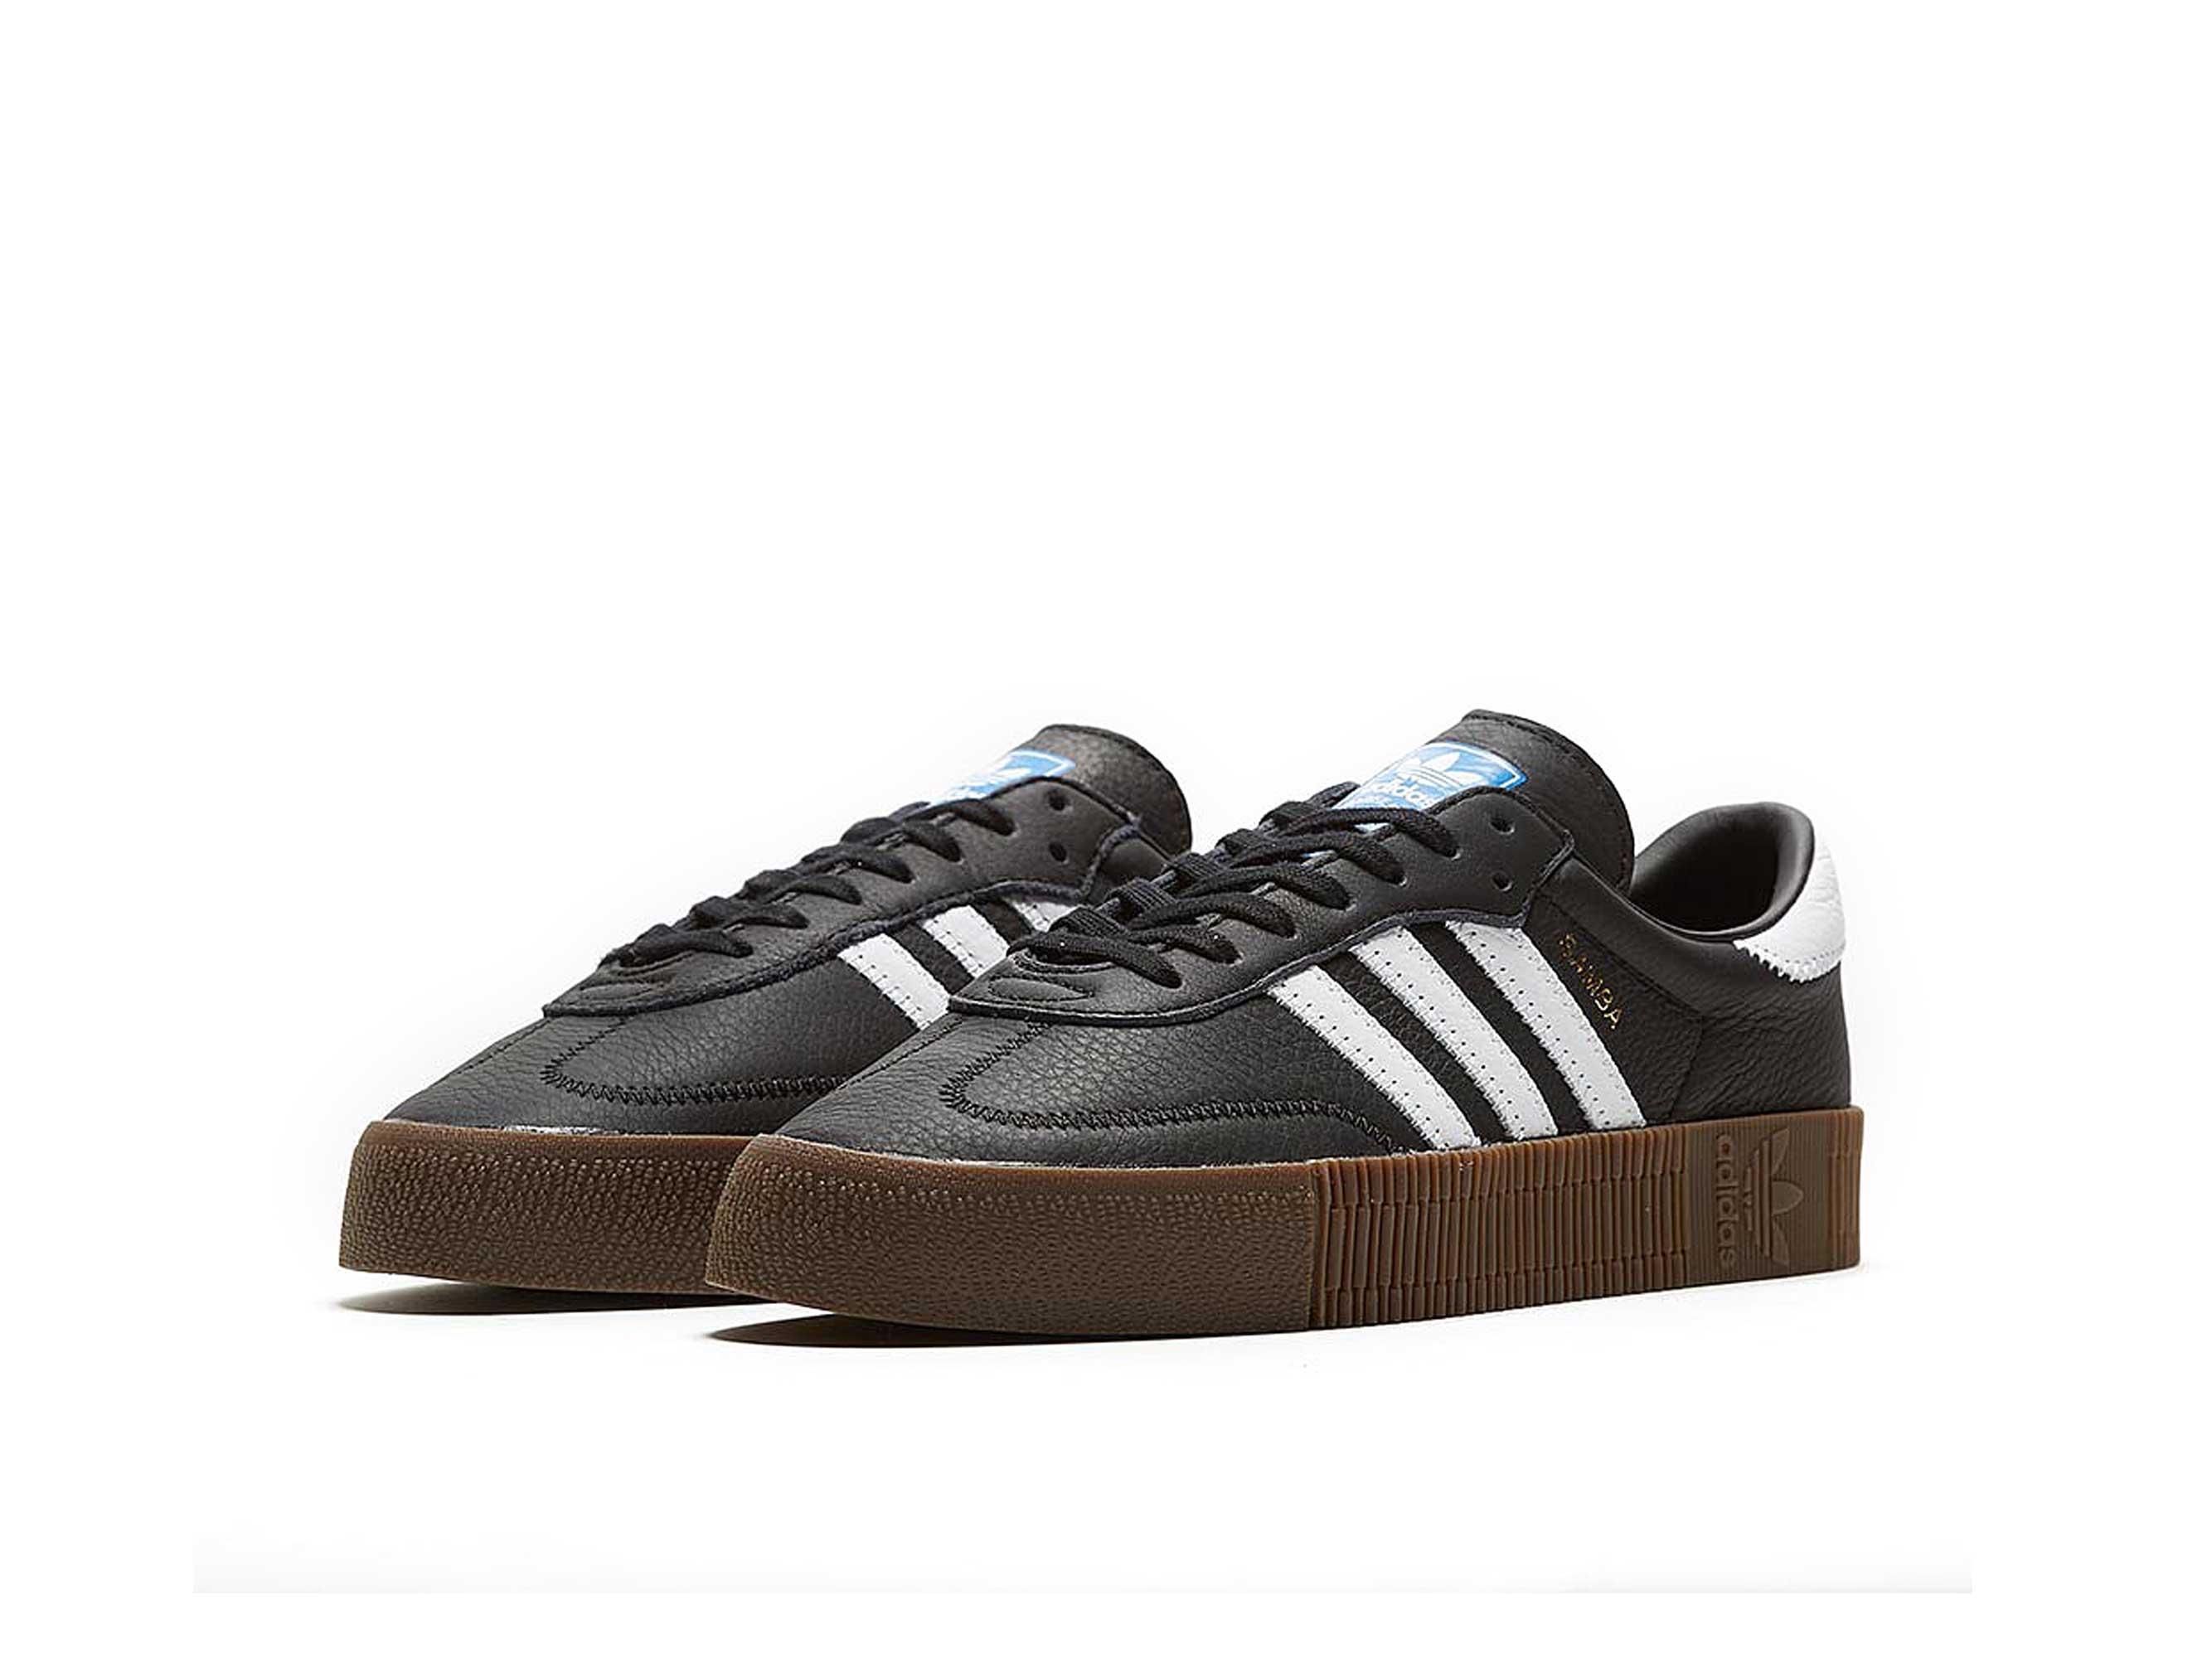 Adidas samba купить